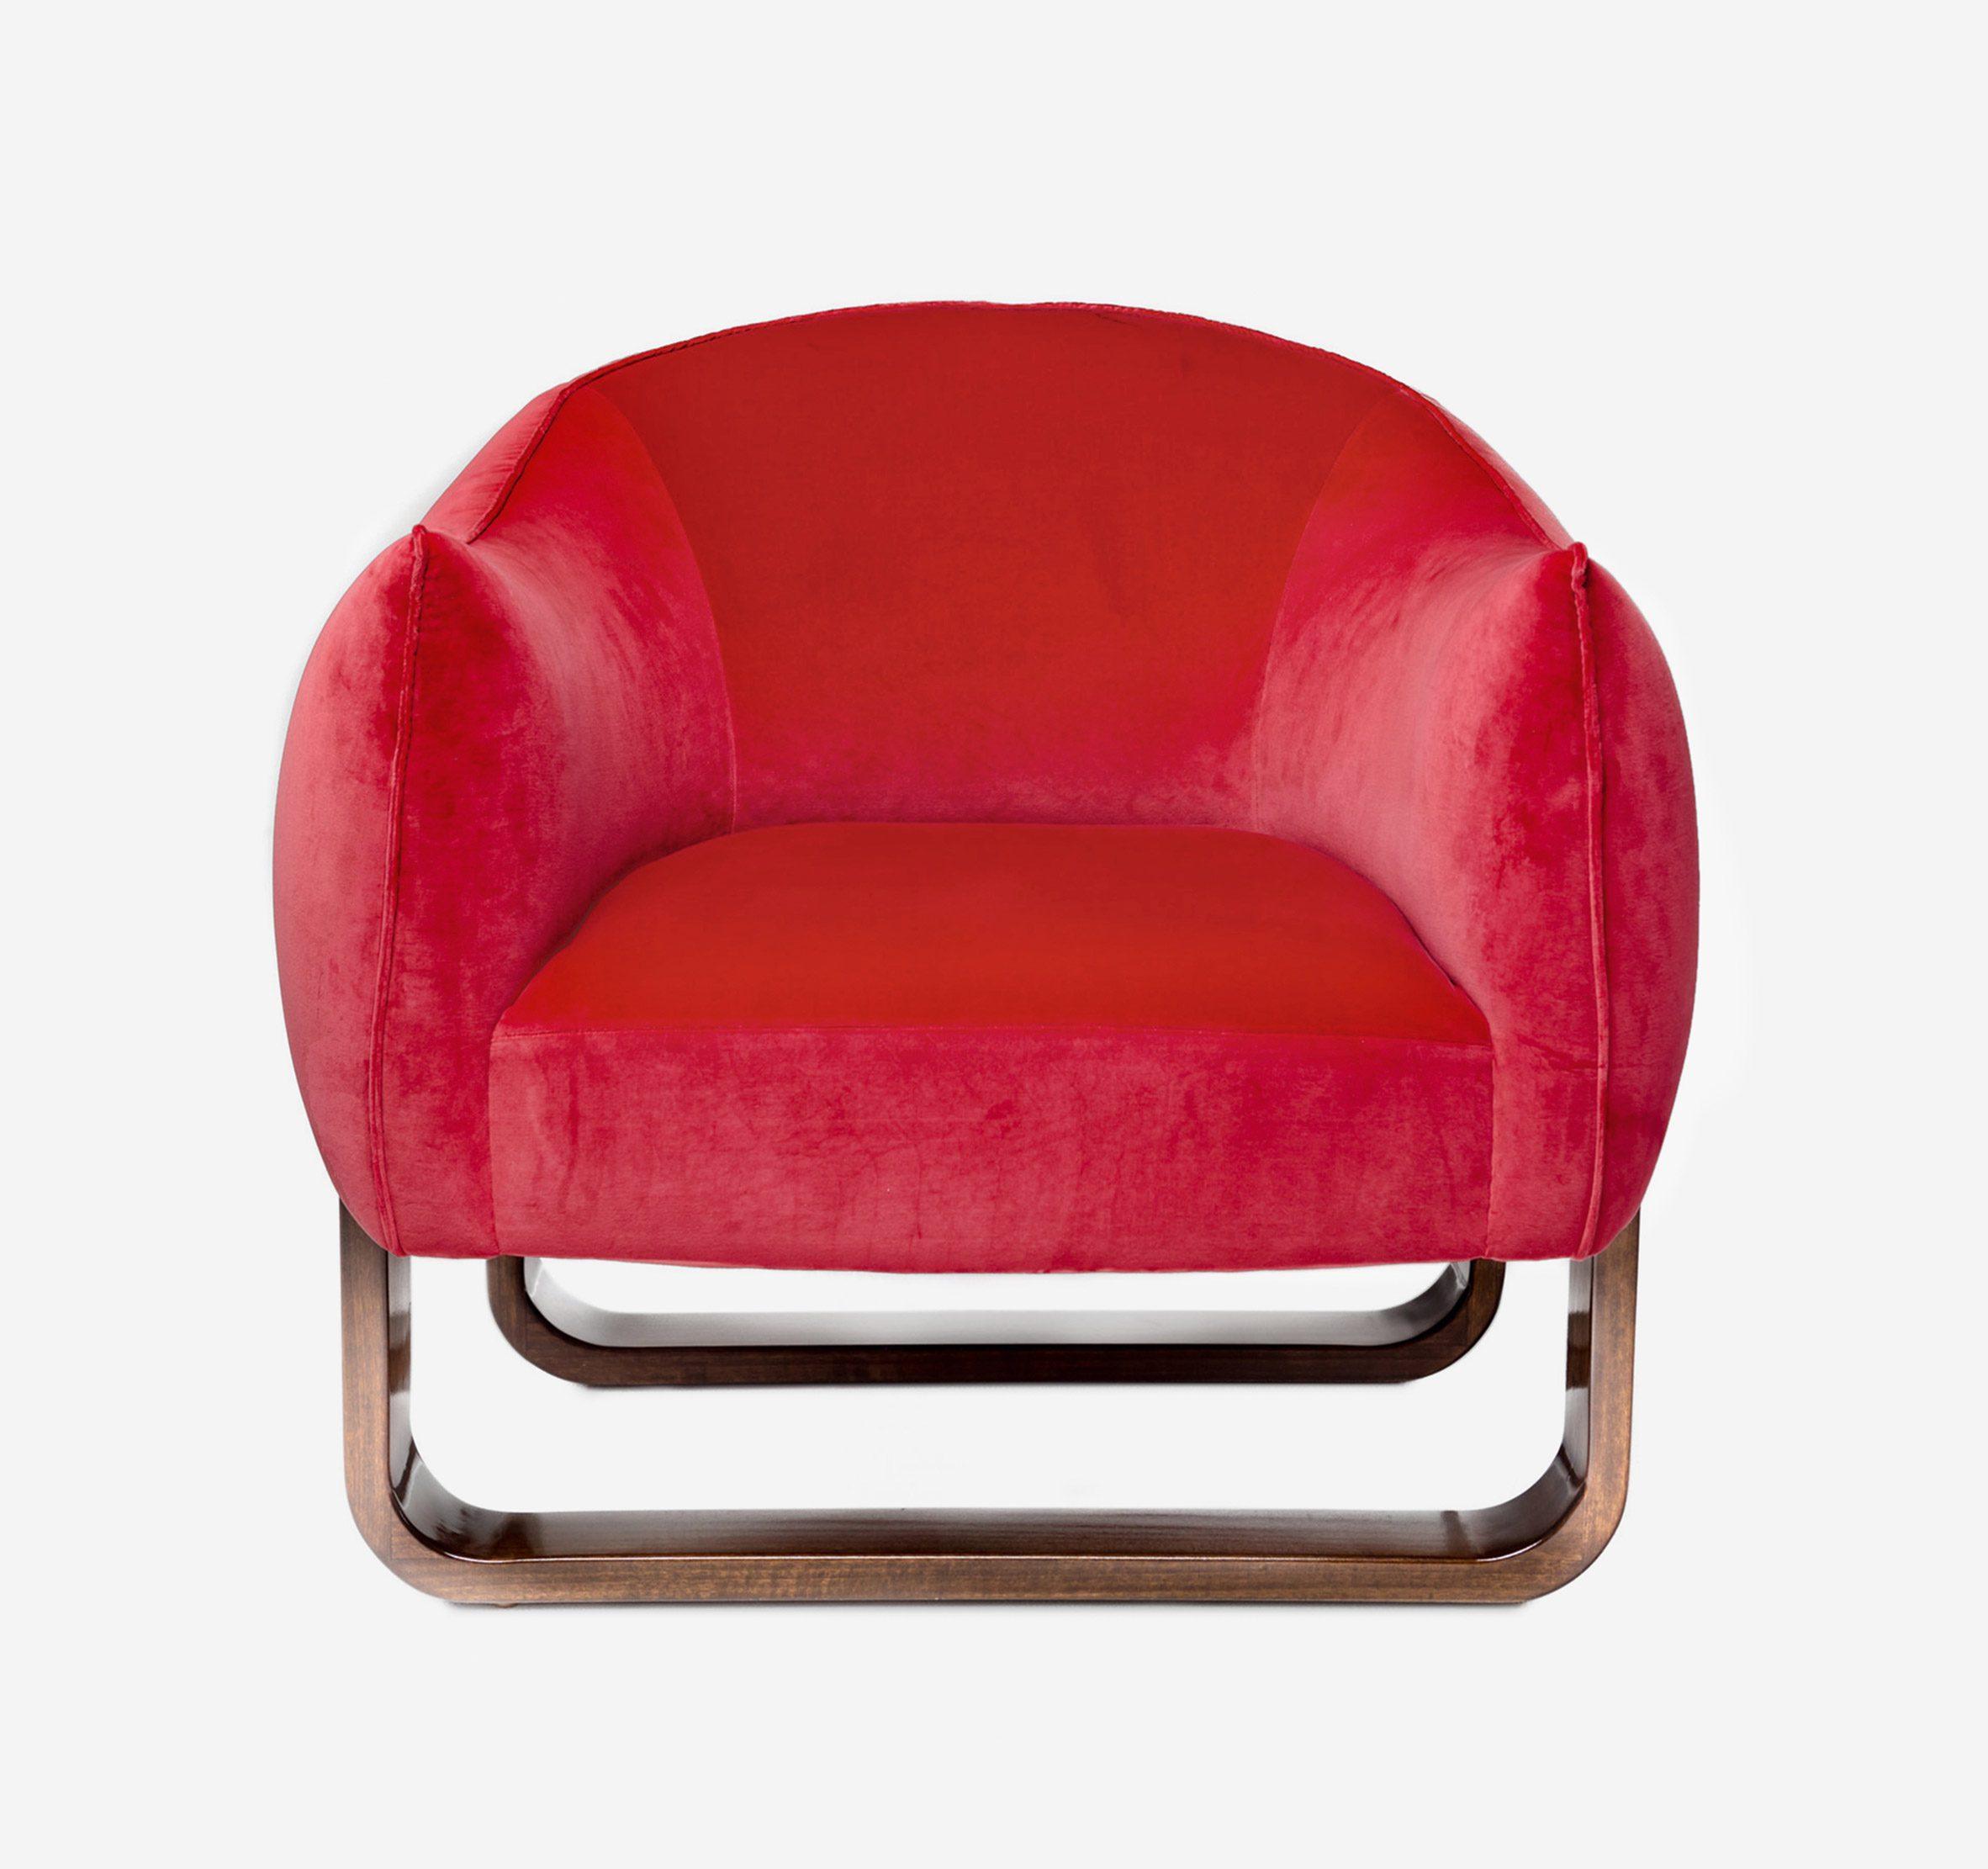 Milo chair, 2018, by Marie Burgos